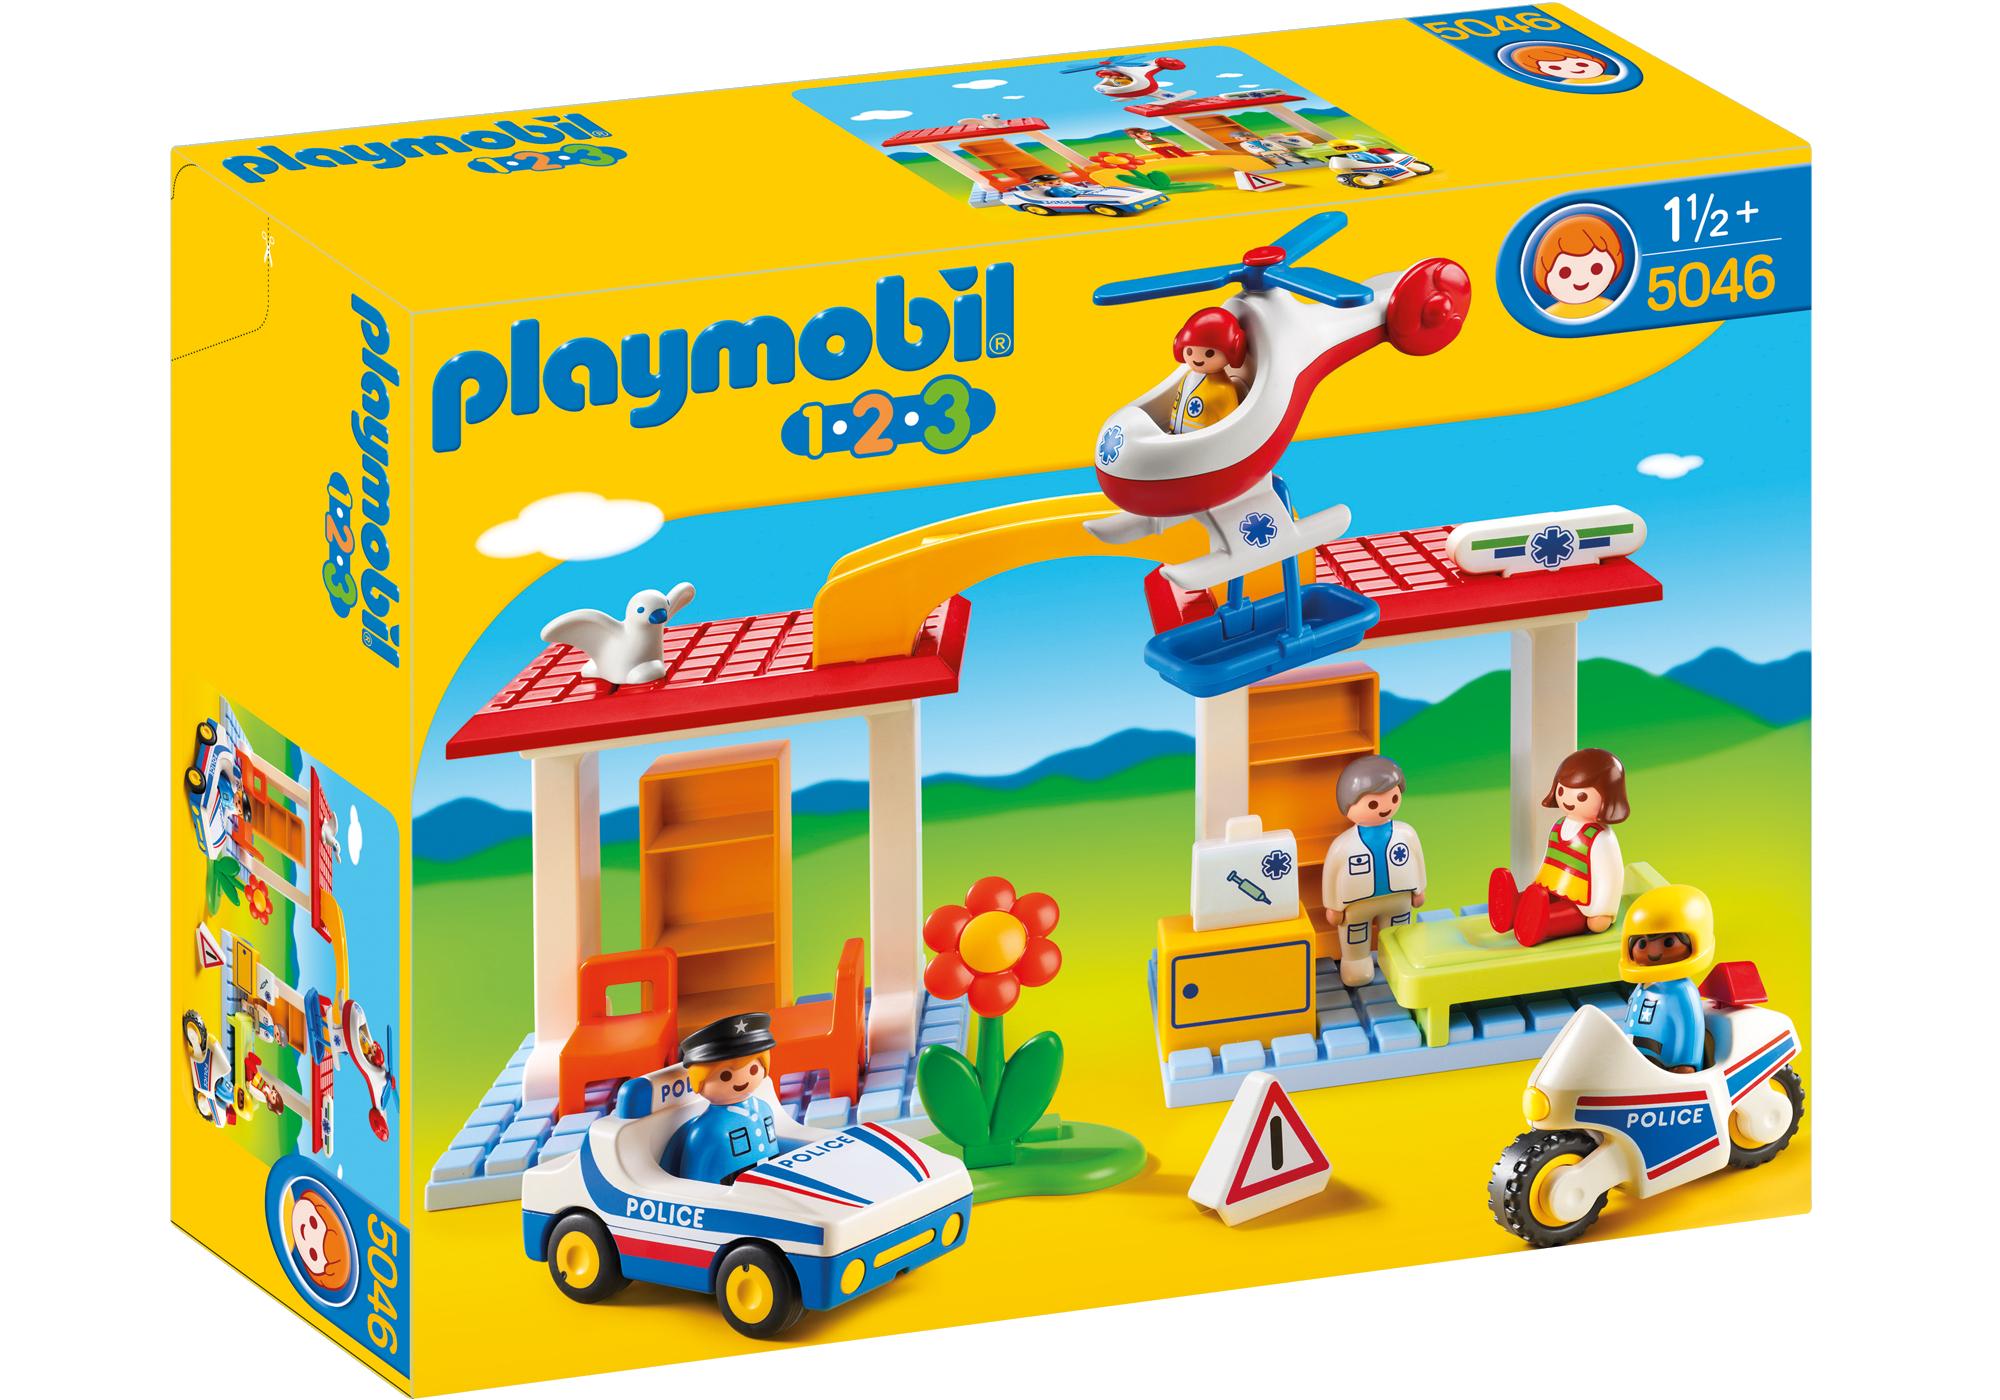 http://media.playmobil.com/i/playmobil/5046_product_box_front/Polizei und Ambulanz 1.2.3